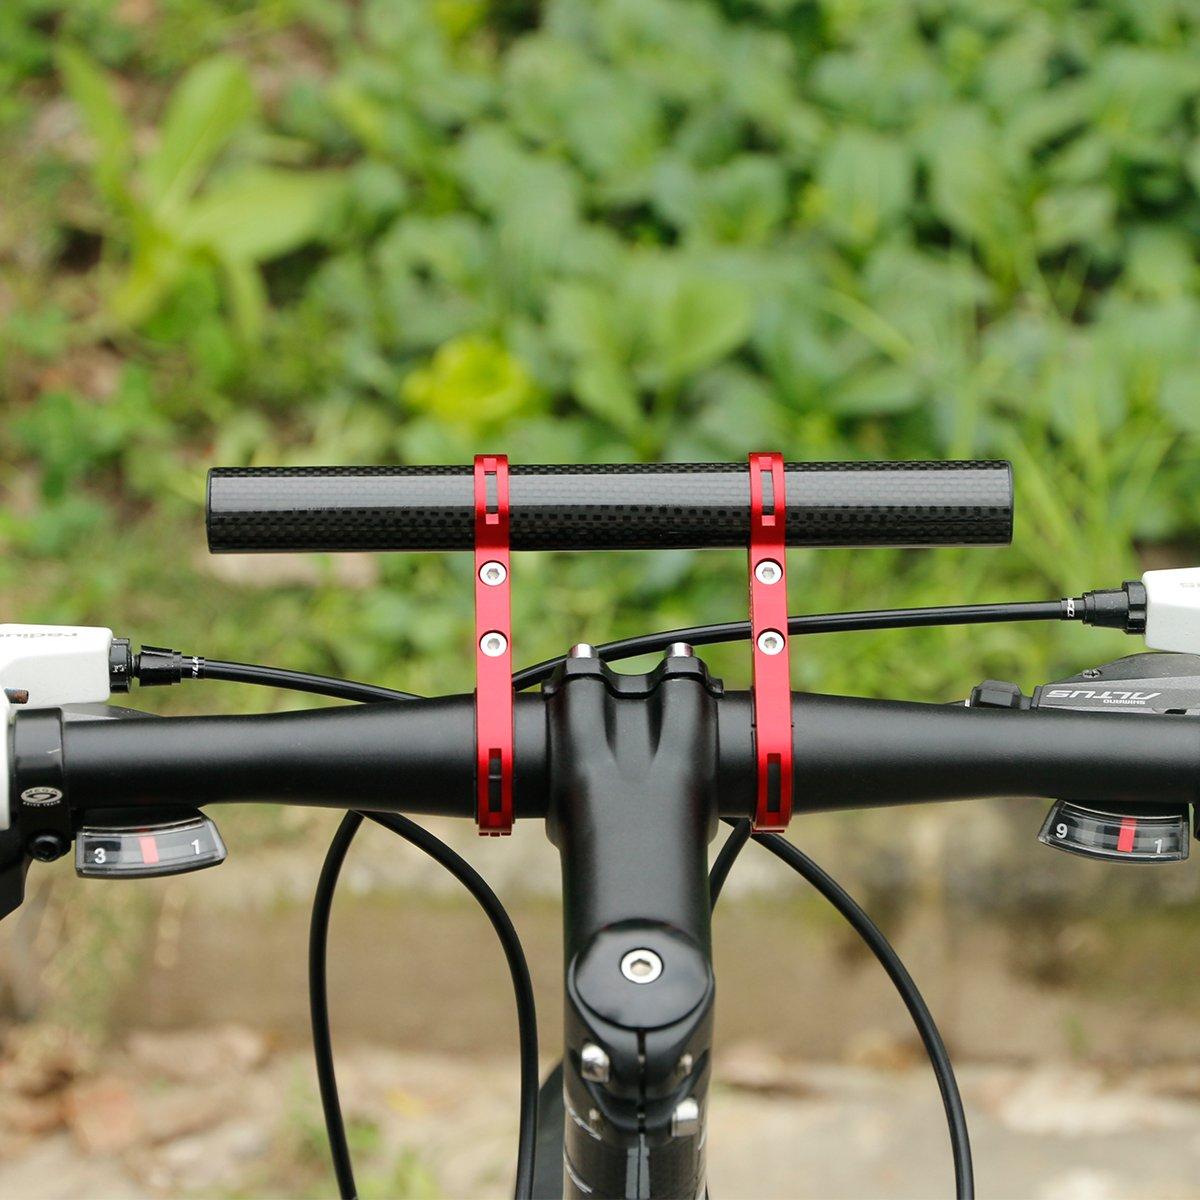 DEEMOUNT Bike Handlebar Extension Rack 202mm Bicycle Double Clamp Bracket Carbon Fiber Extender Accessories Flashlight Lamp Phone Mount Bracket Stand Holder Space Saver - Red by DEEMOUNT (Image #9)